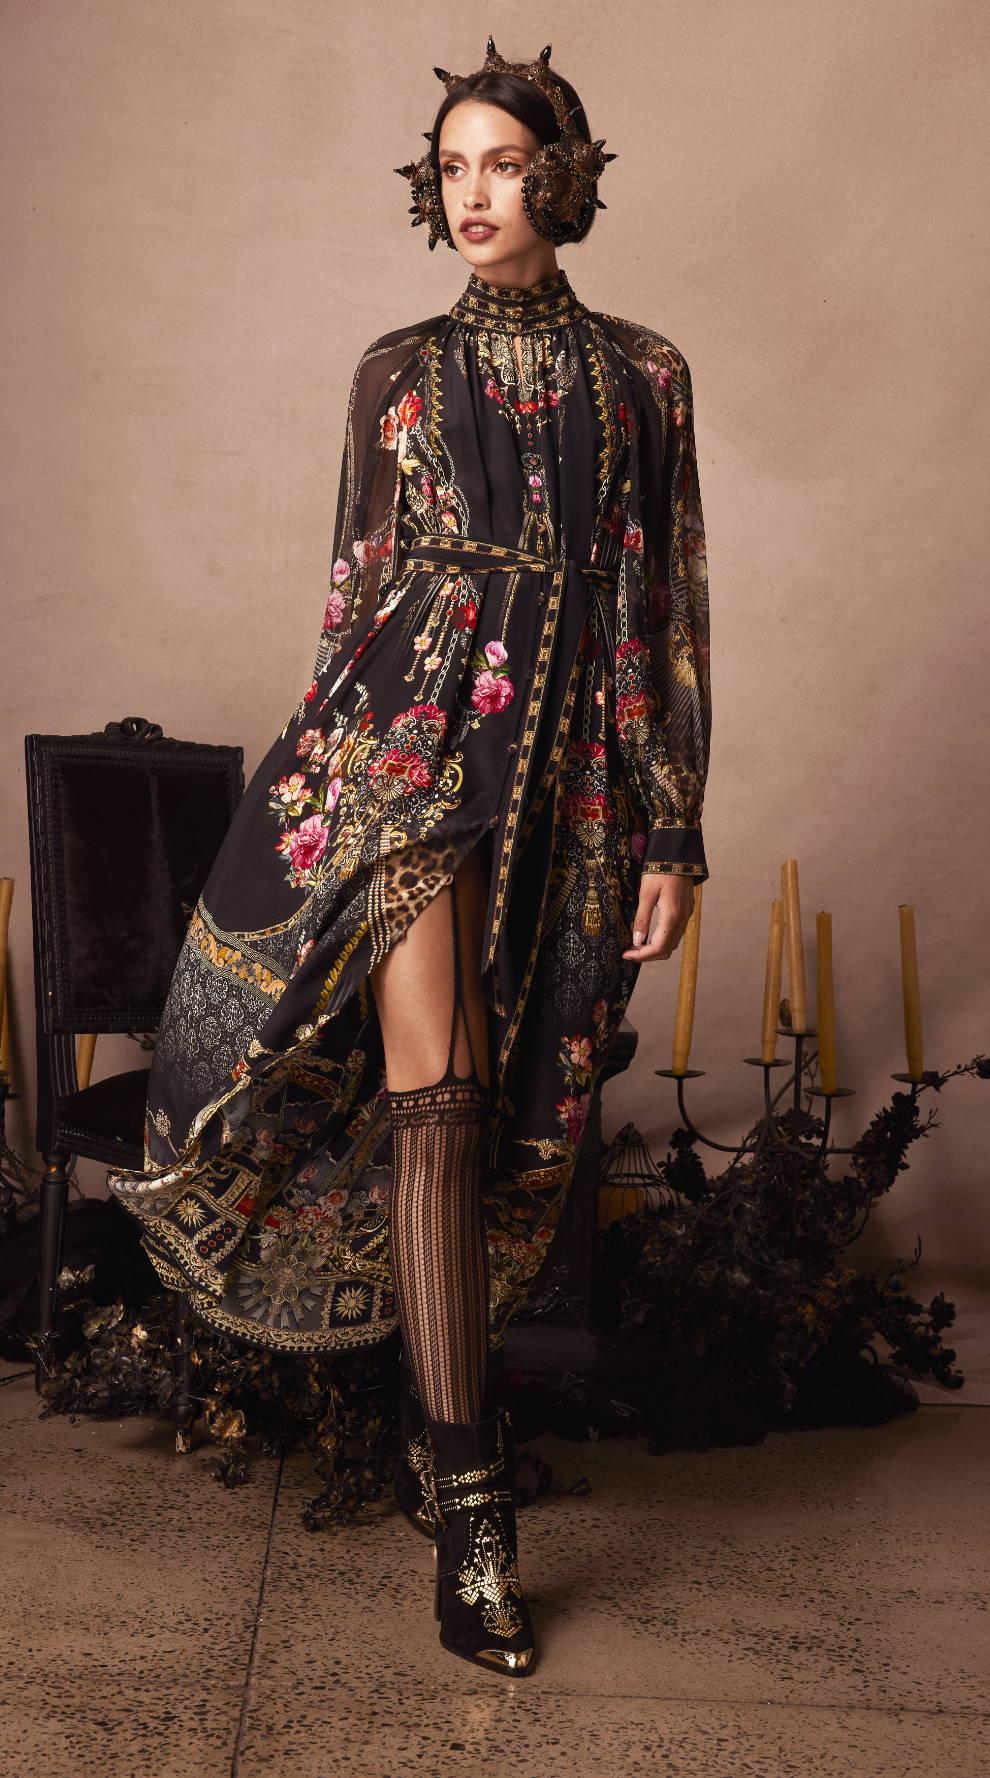 CAMILLA Gothic Goddess Dress